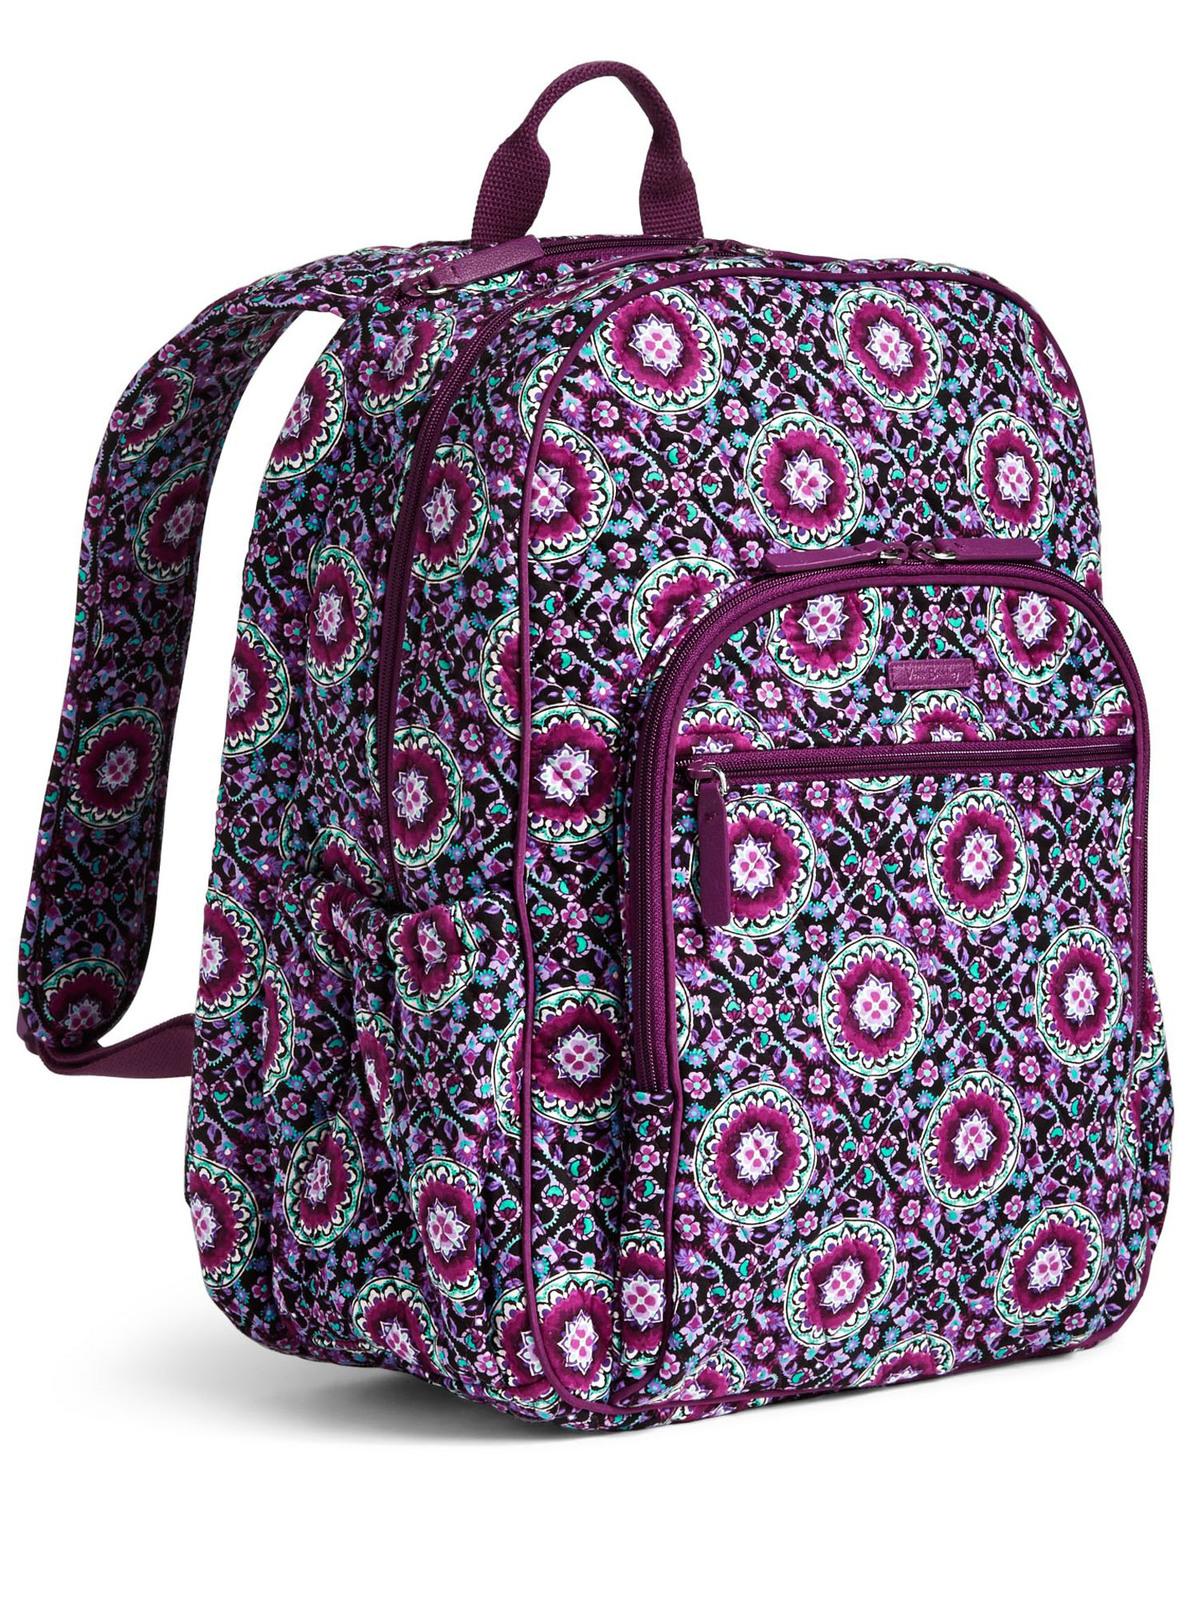 Vera Bradley Signature Cotton Campus Tech Backpack, Lilac Medallion image 5